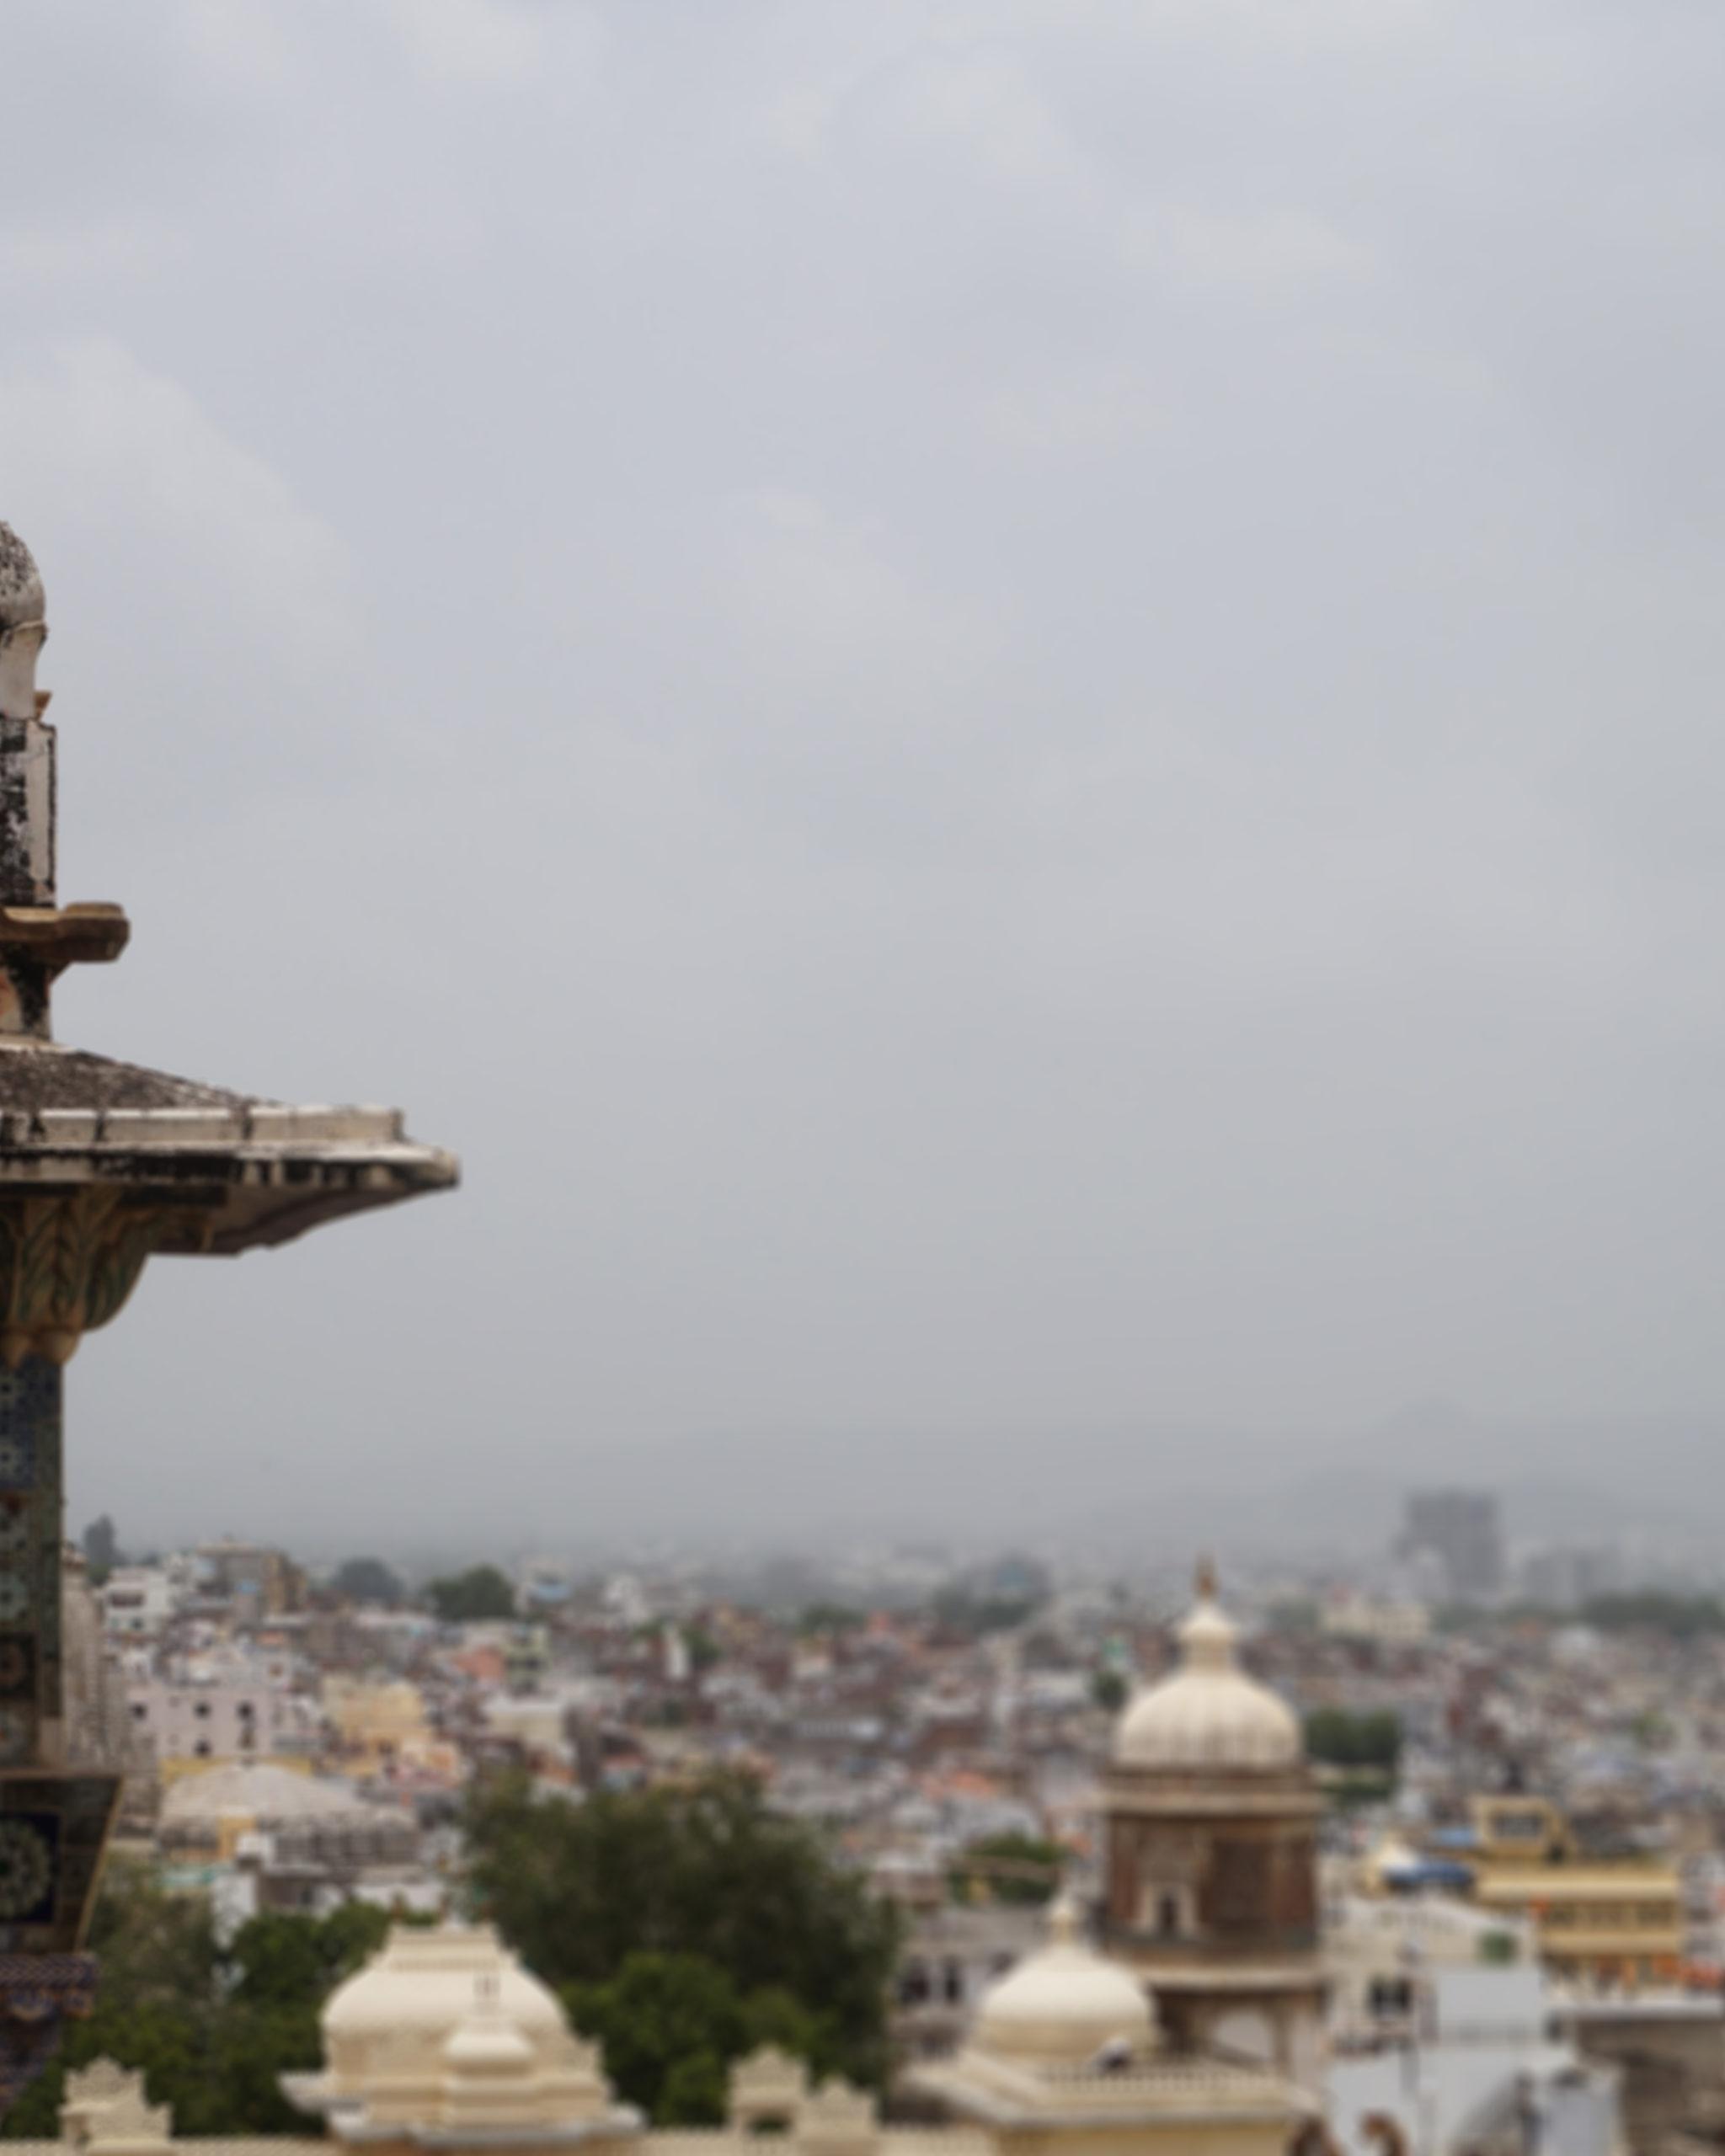 jaipur city background